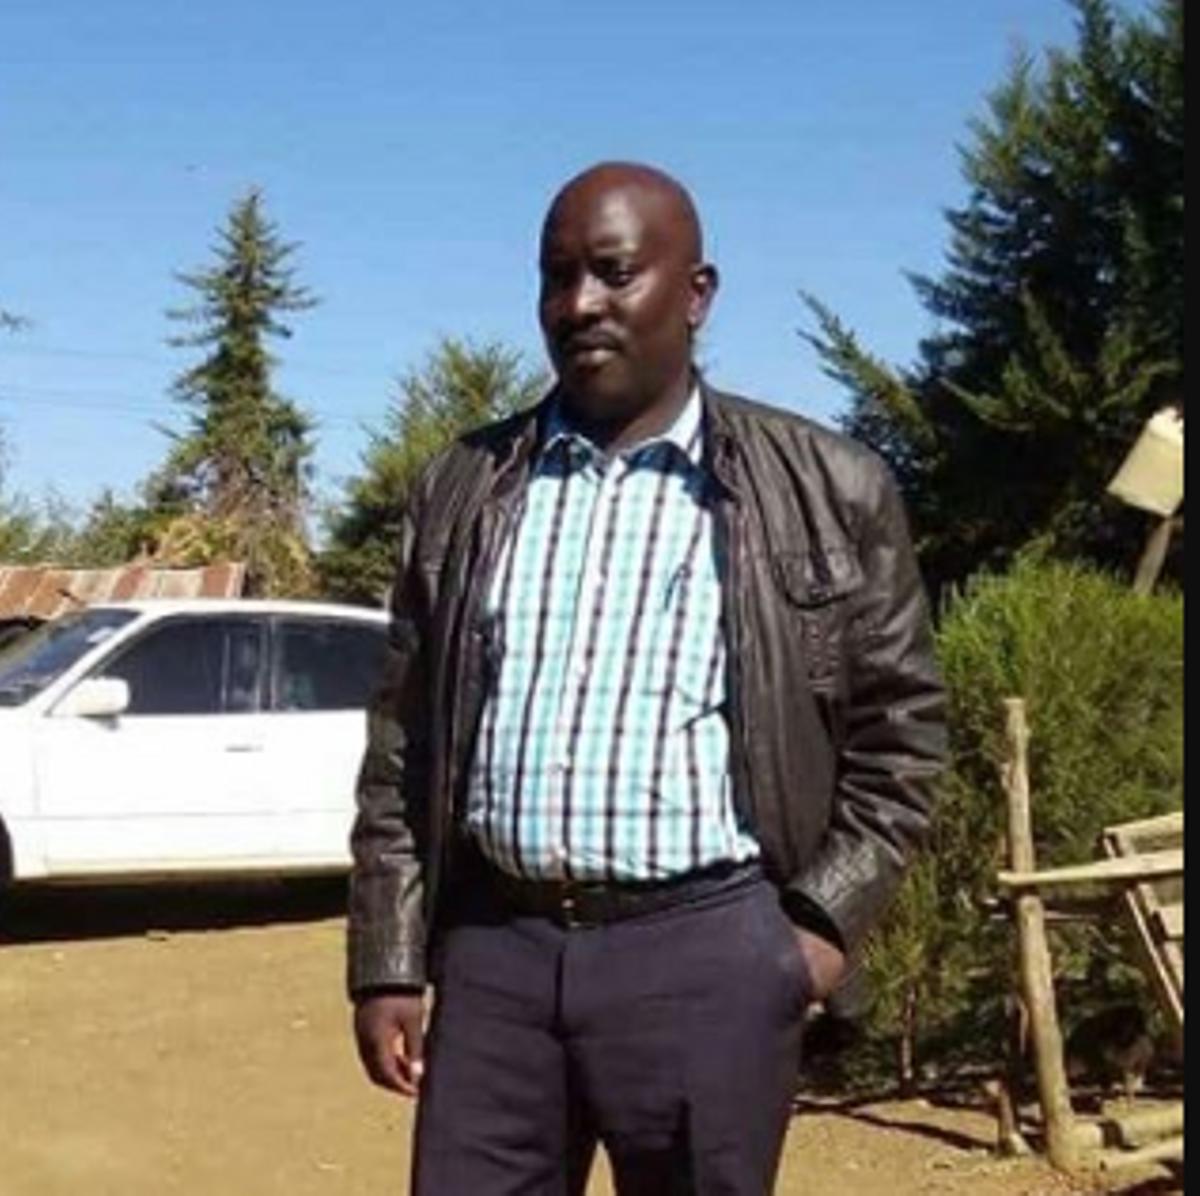 Eldoret mourning following tragic death of Silverline hotel